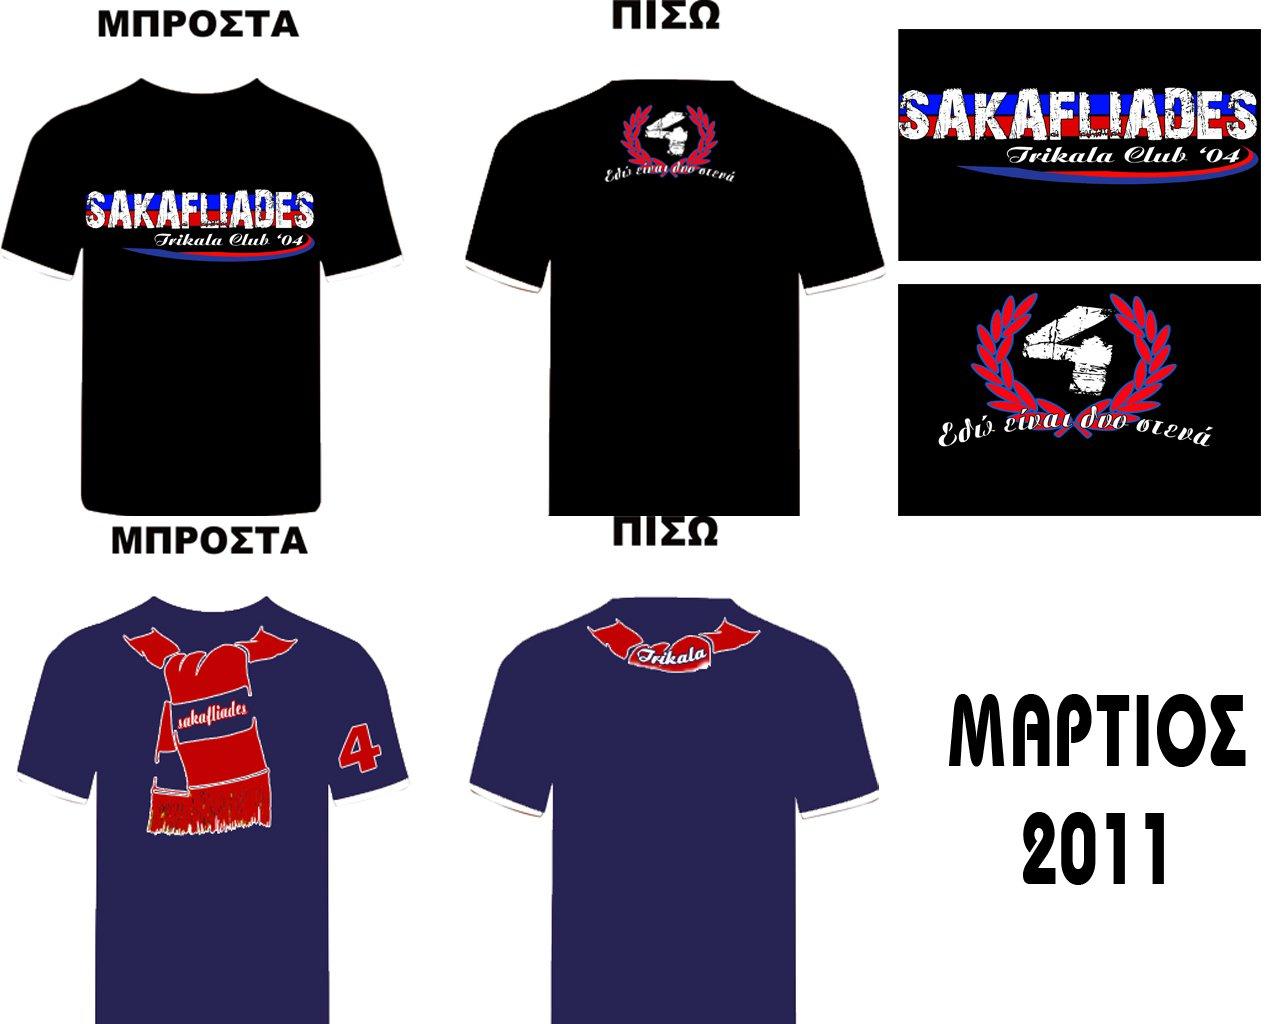 0da4e534fc34 TRIKALA WEB MAGAZINE FATSIMARE.GR  Σακαφλιάδες  2 ΝΕΑ T-shirts για ...